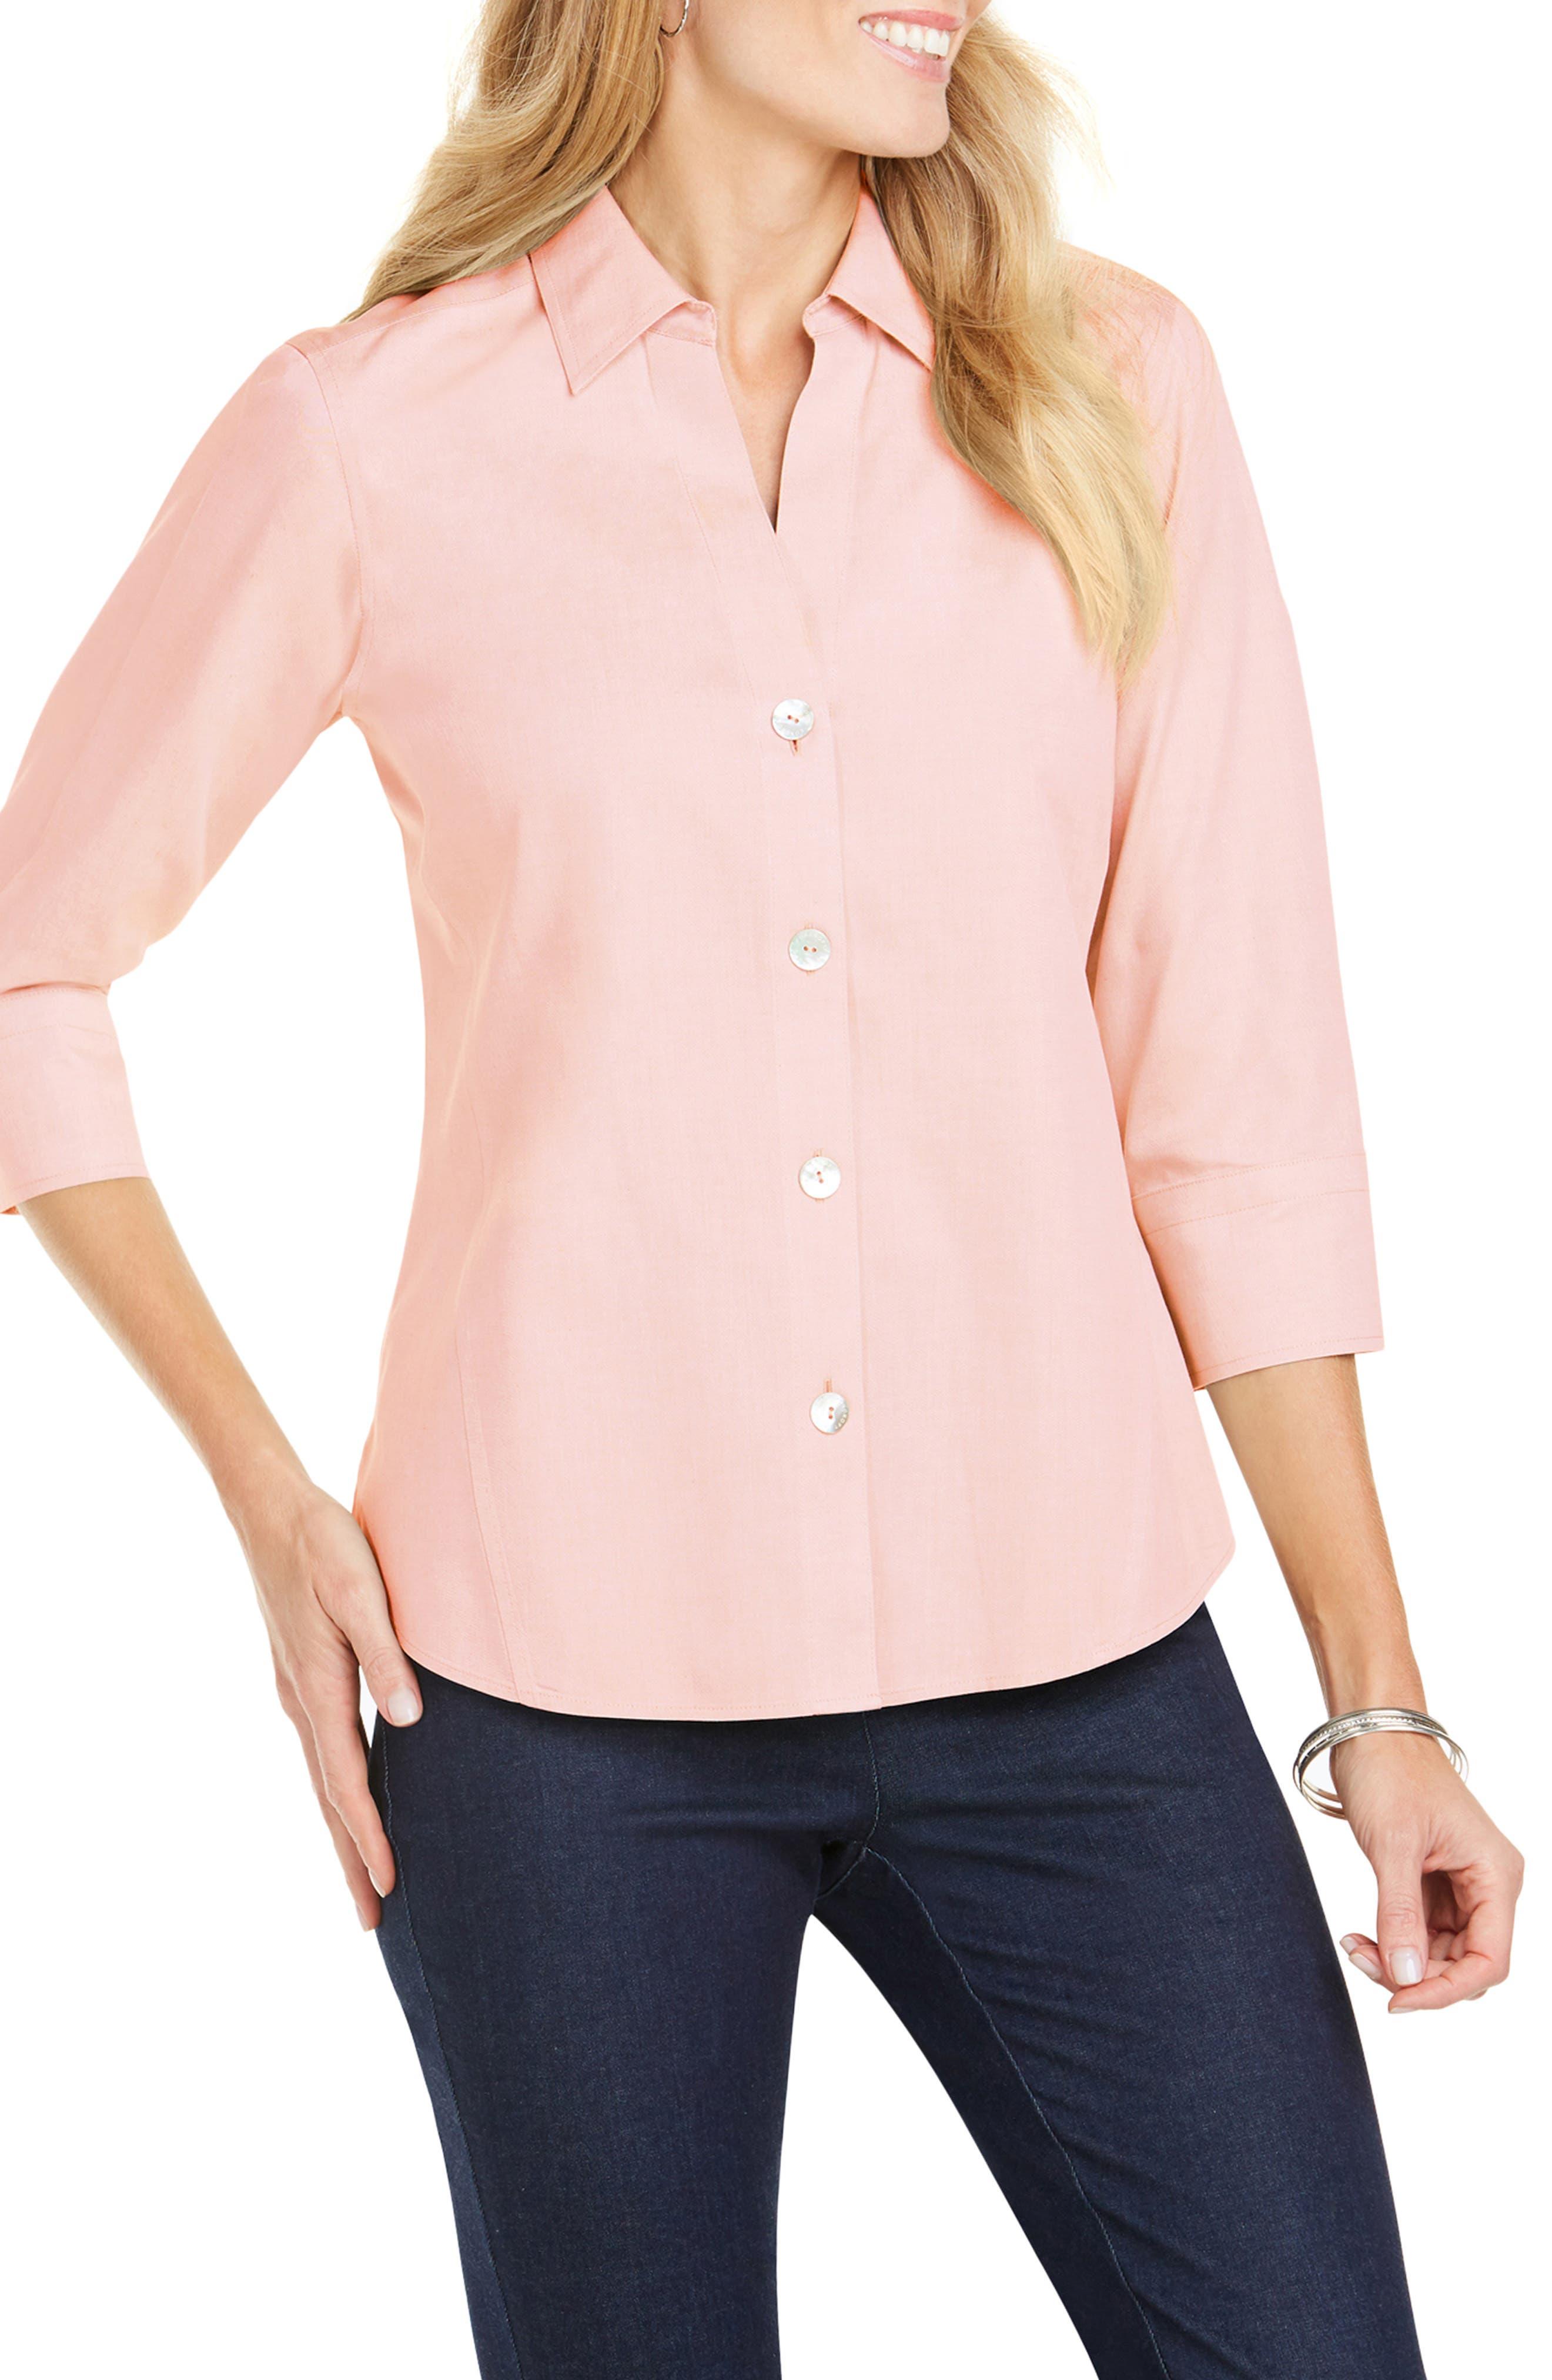 Paityn Non-Iron Cotton Shirt